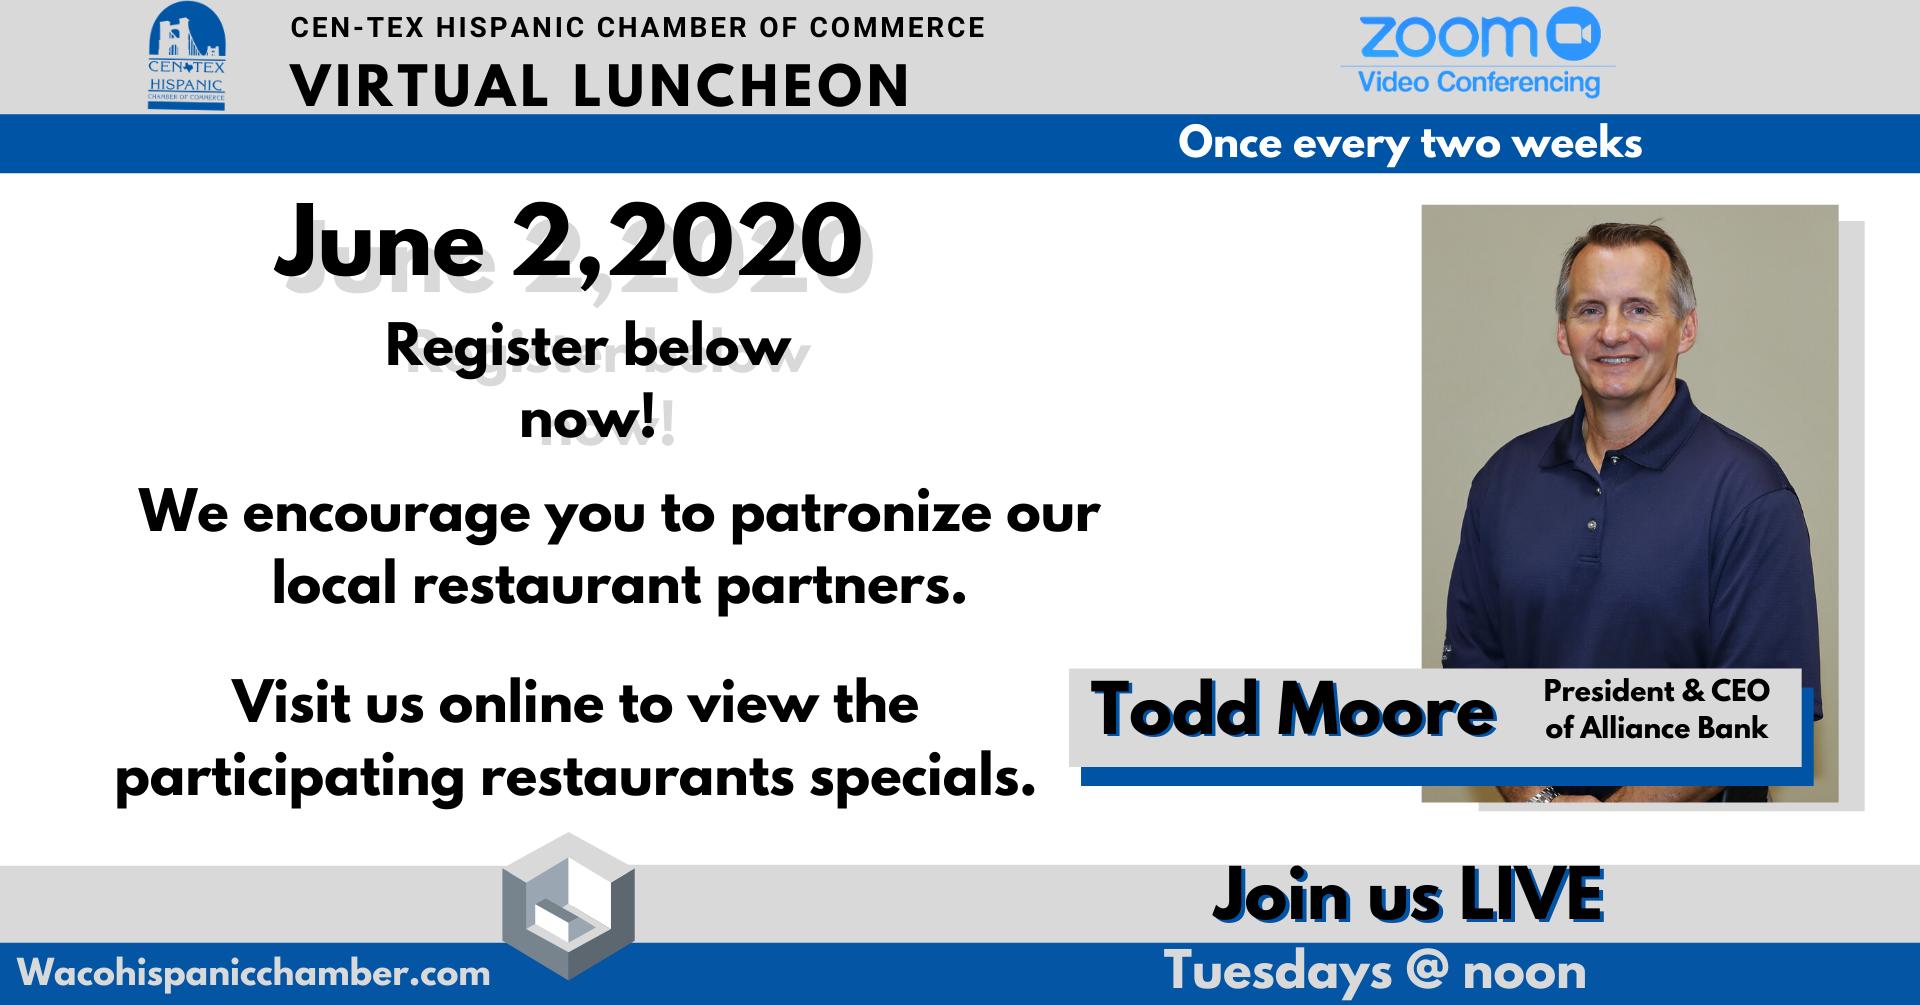 Todd Moore Luncheon